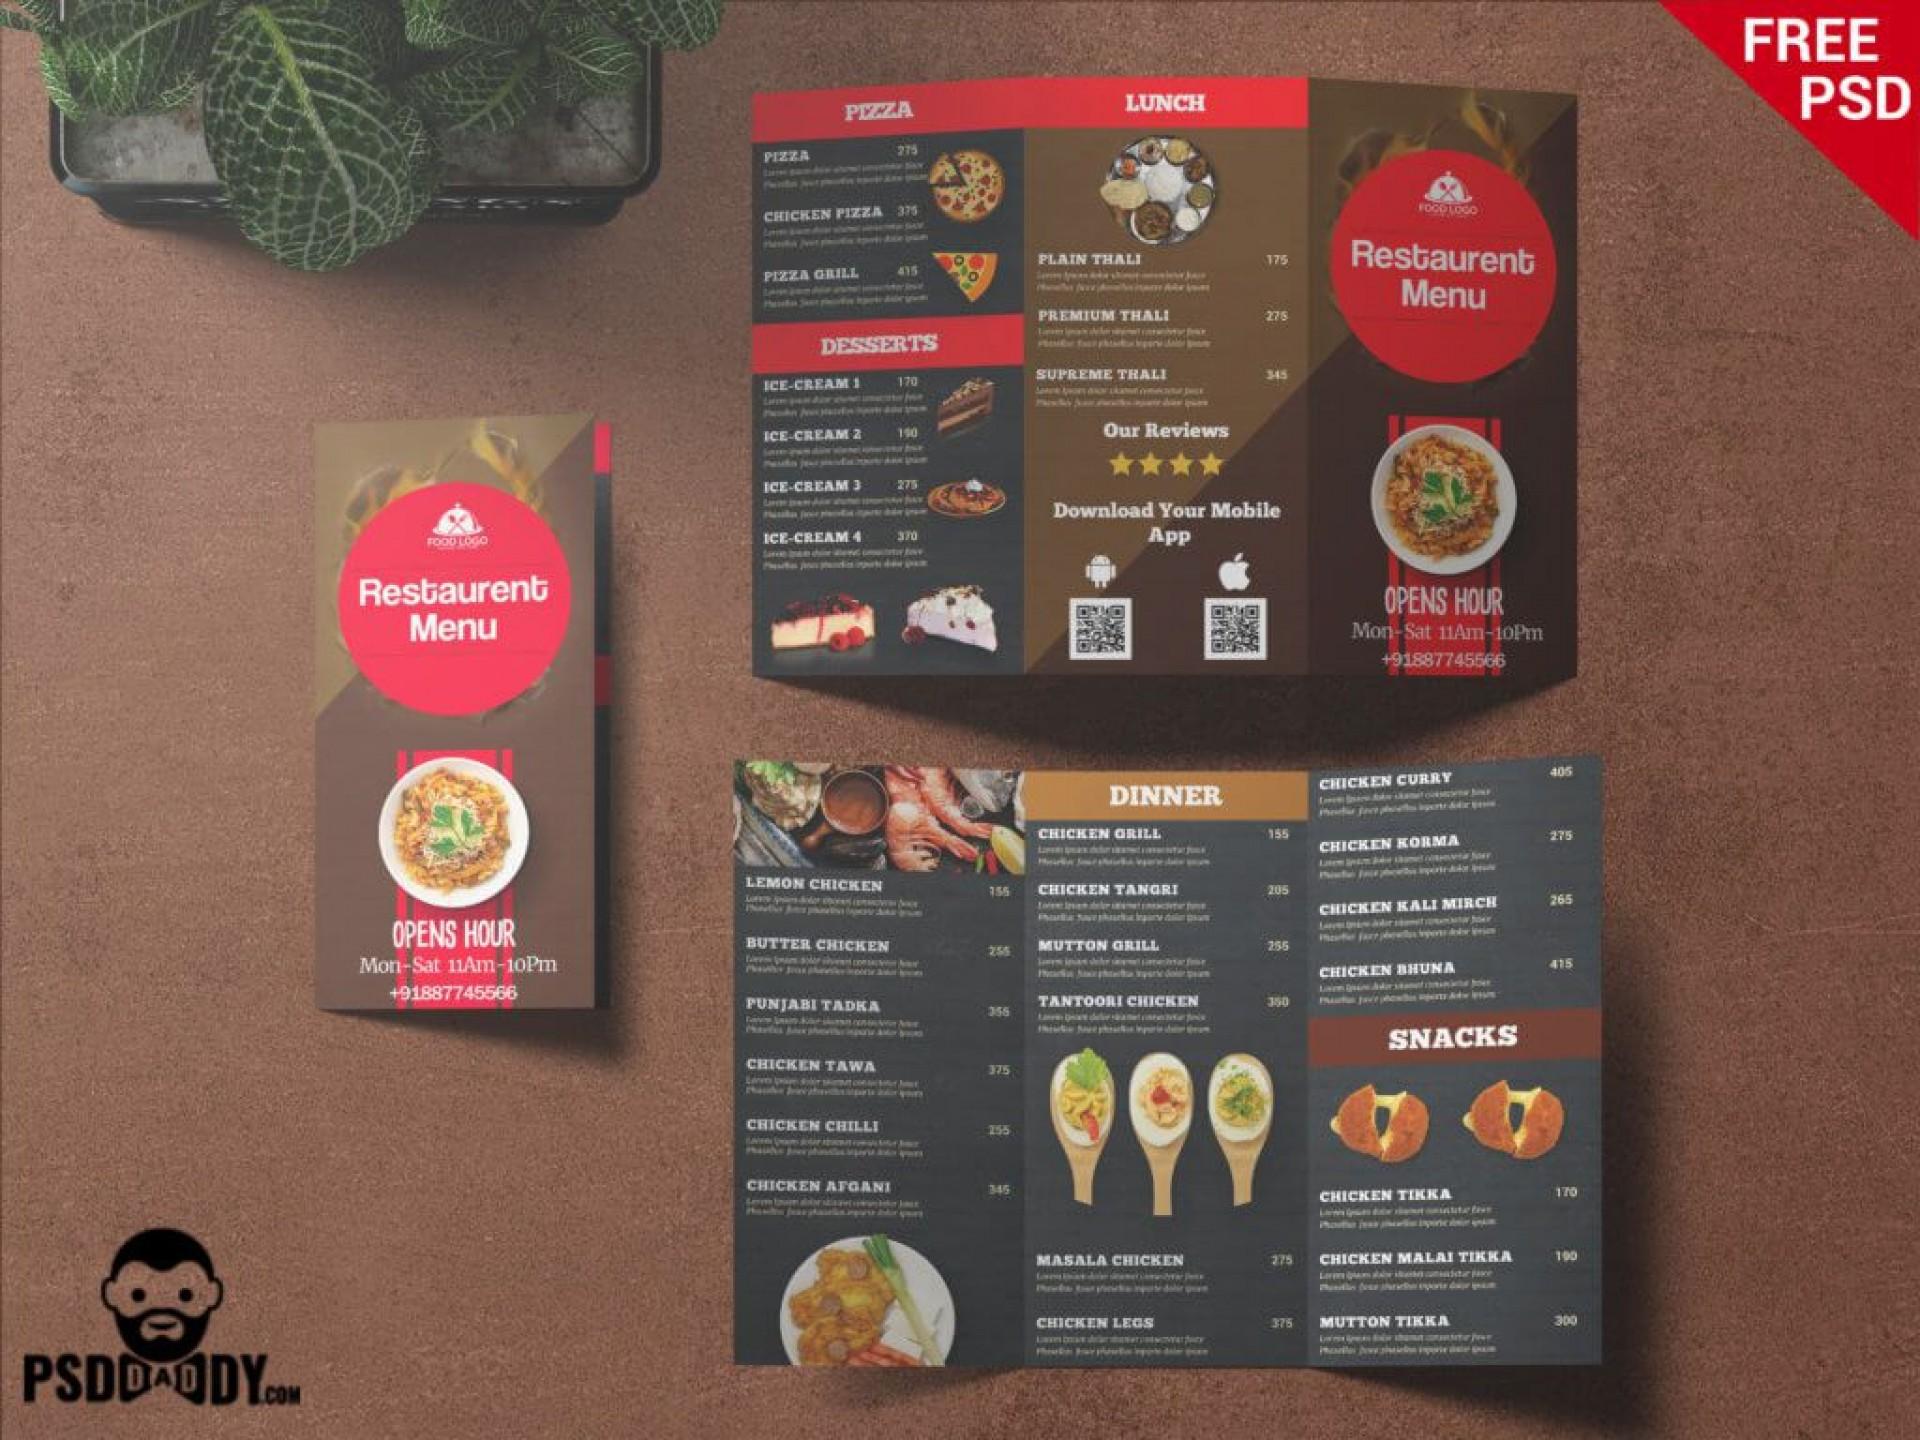 007 Fascinating Tri Fold Menu Template Idea  Templates Restaurant Tri-fold Food Free Psd1920